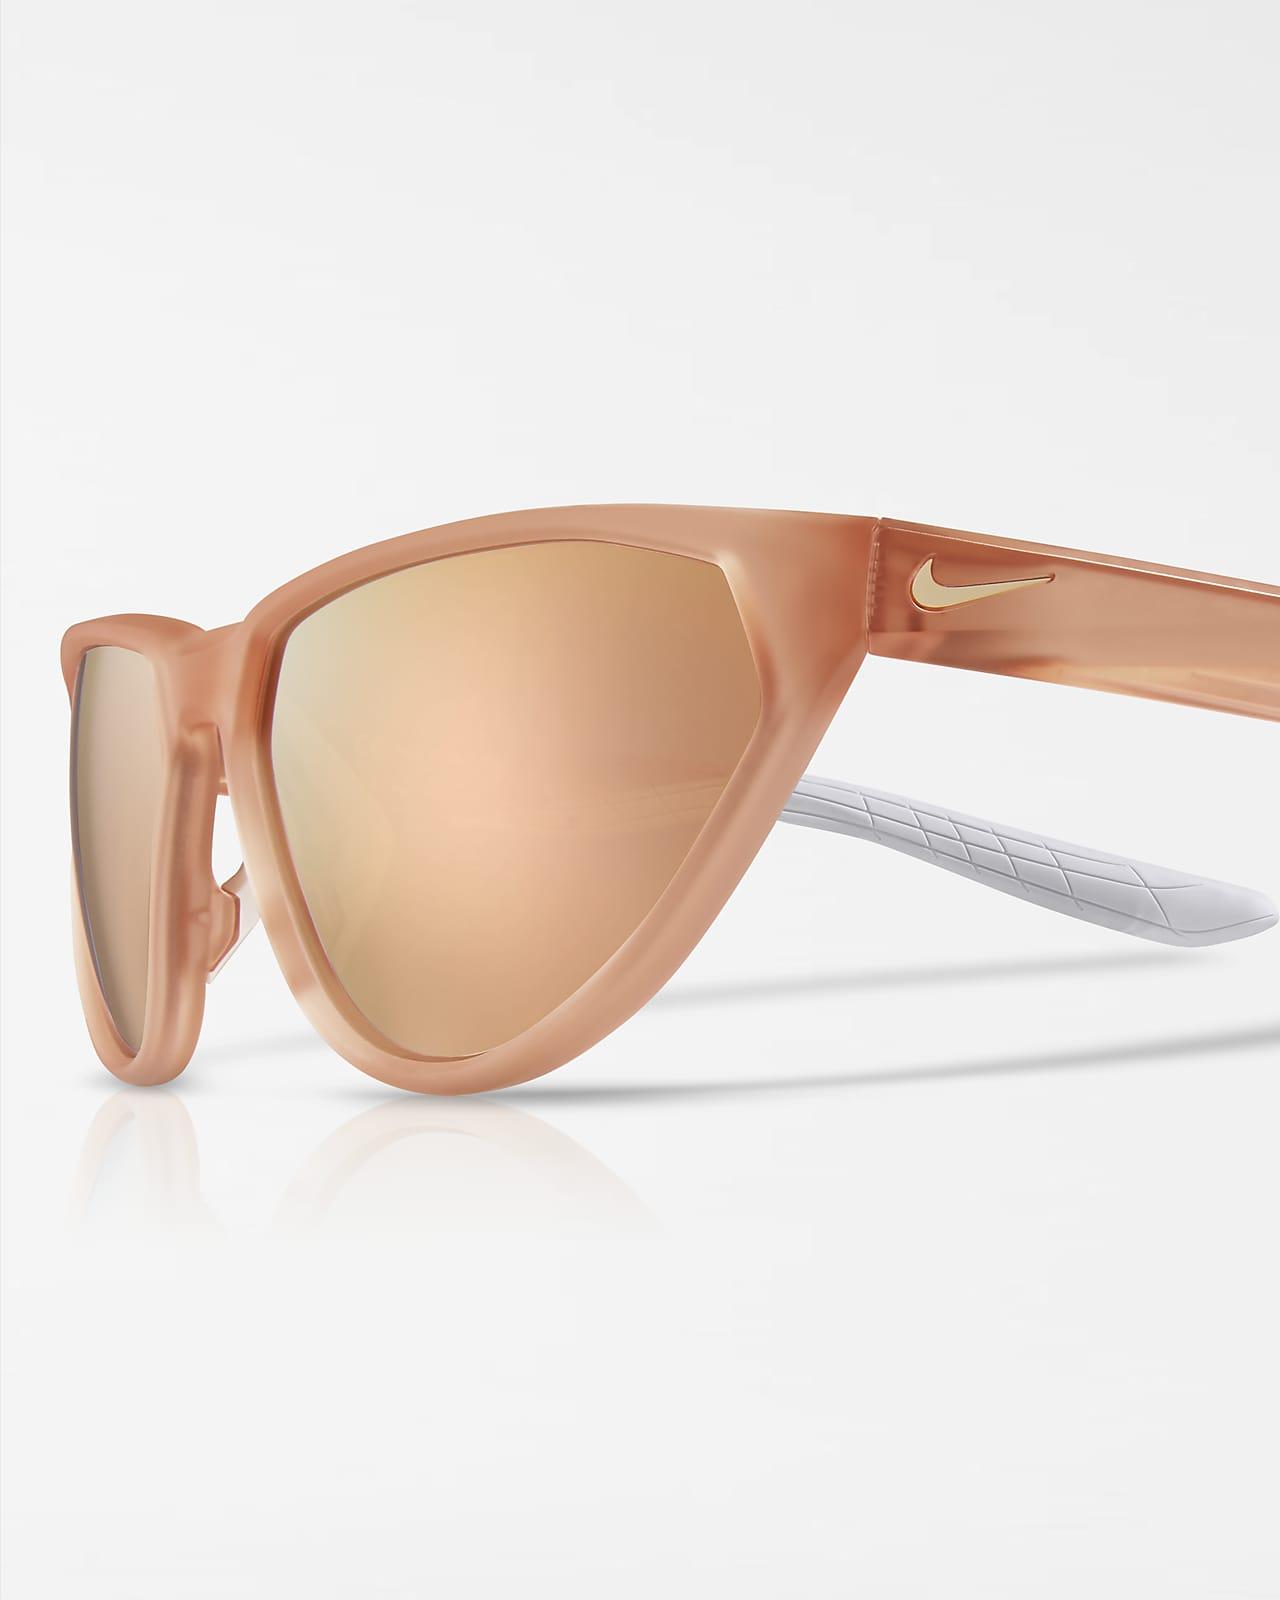 Nike Maverick Fierce Mirrored Sunglasses